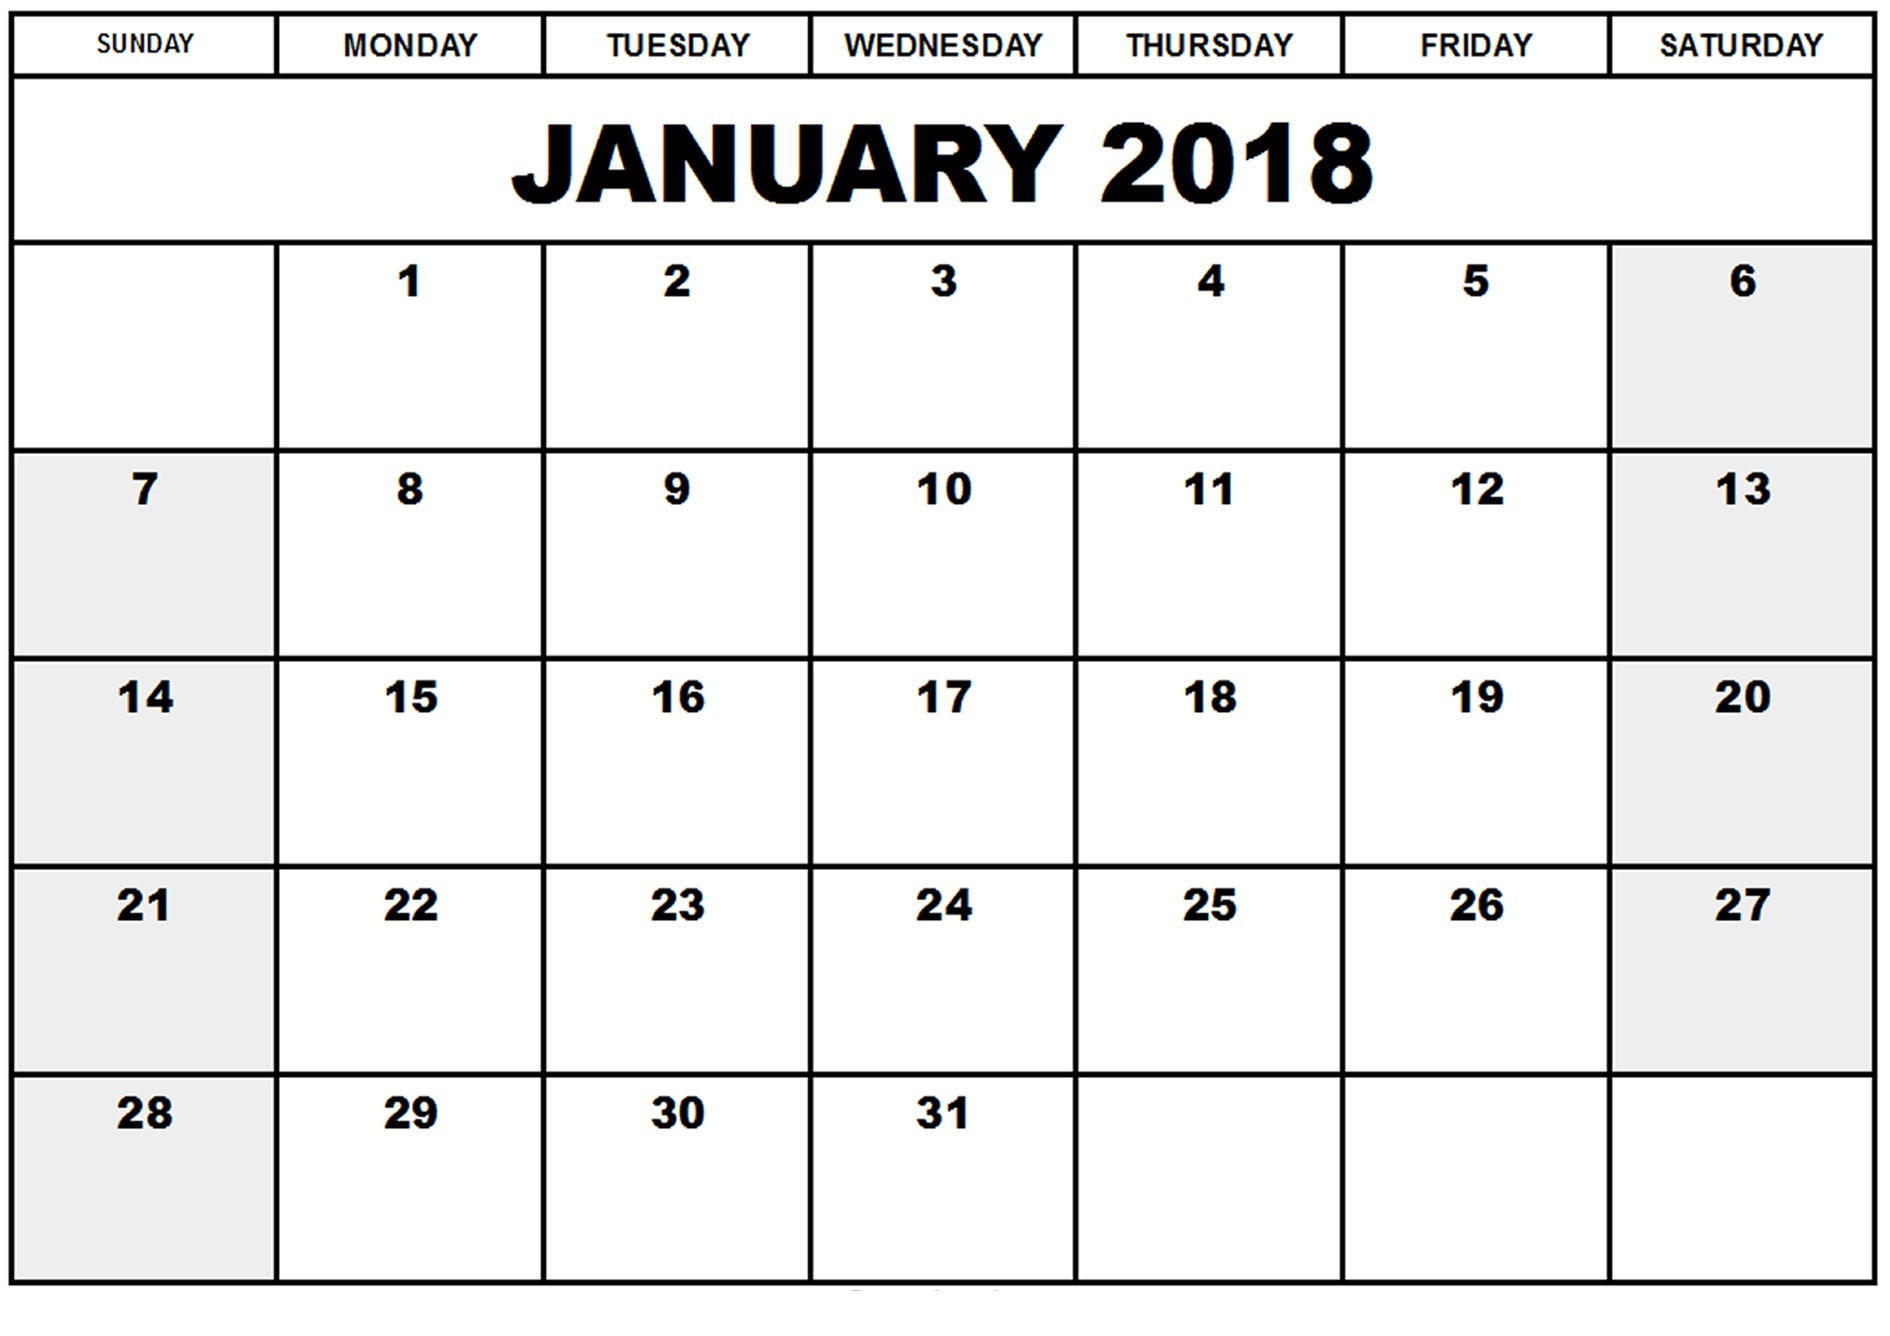 january-2018-calendar-printable